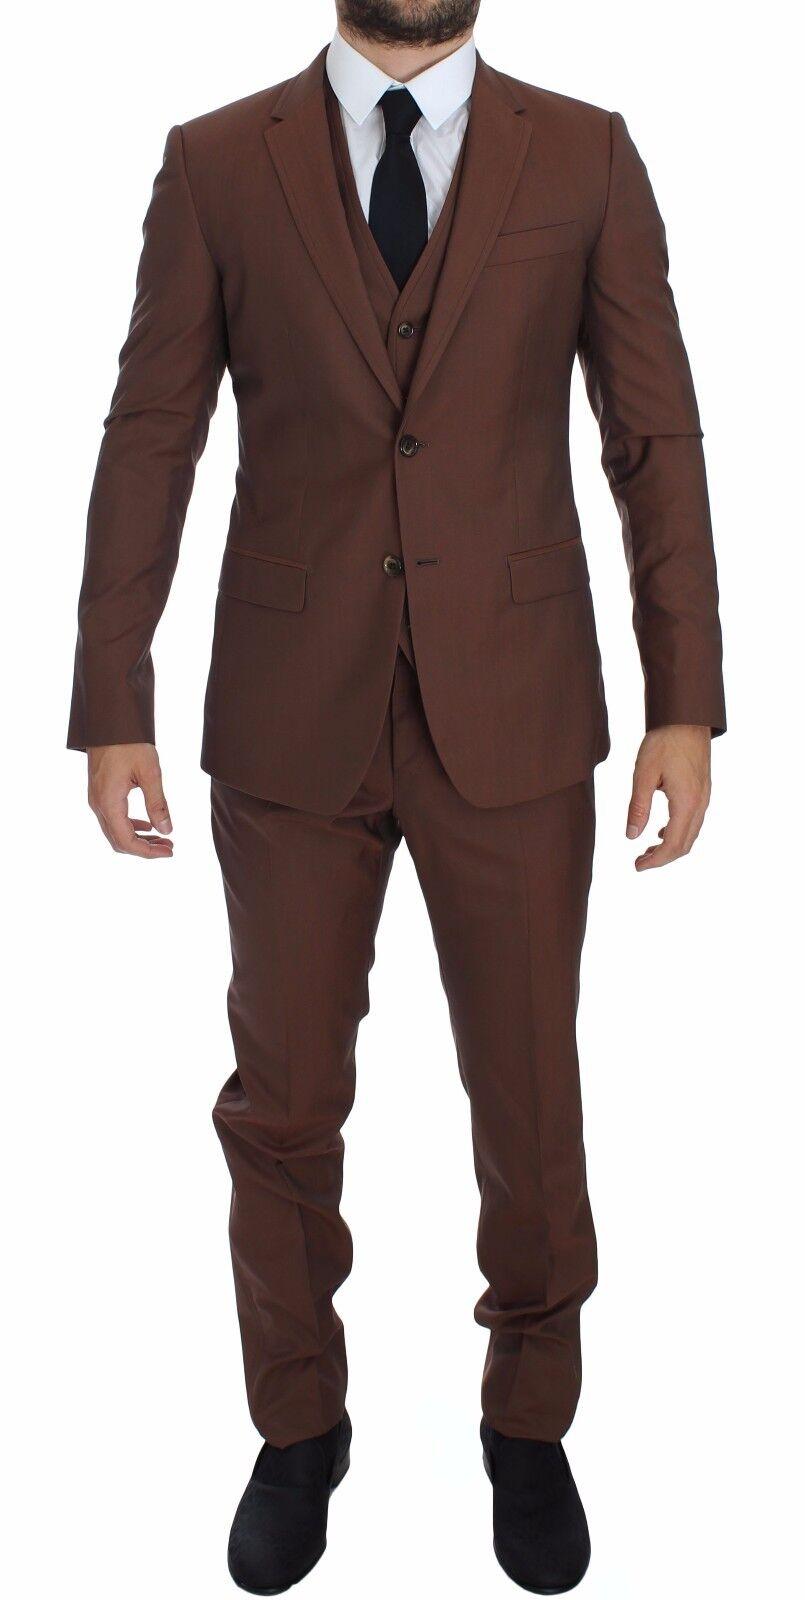 NWT 2600 DOLCE & GABBANA Braun Silk Wool 3 Piece Slim Fit Suit EU46 /US36 /S